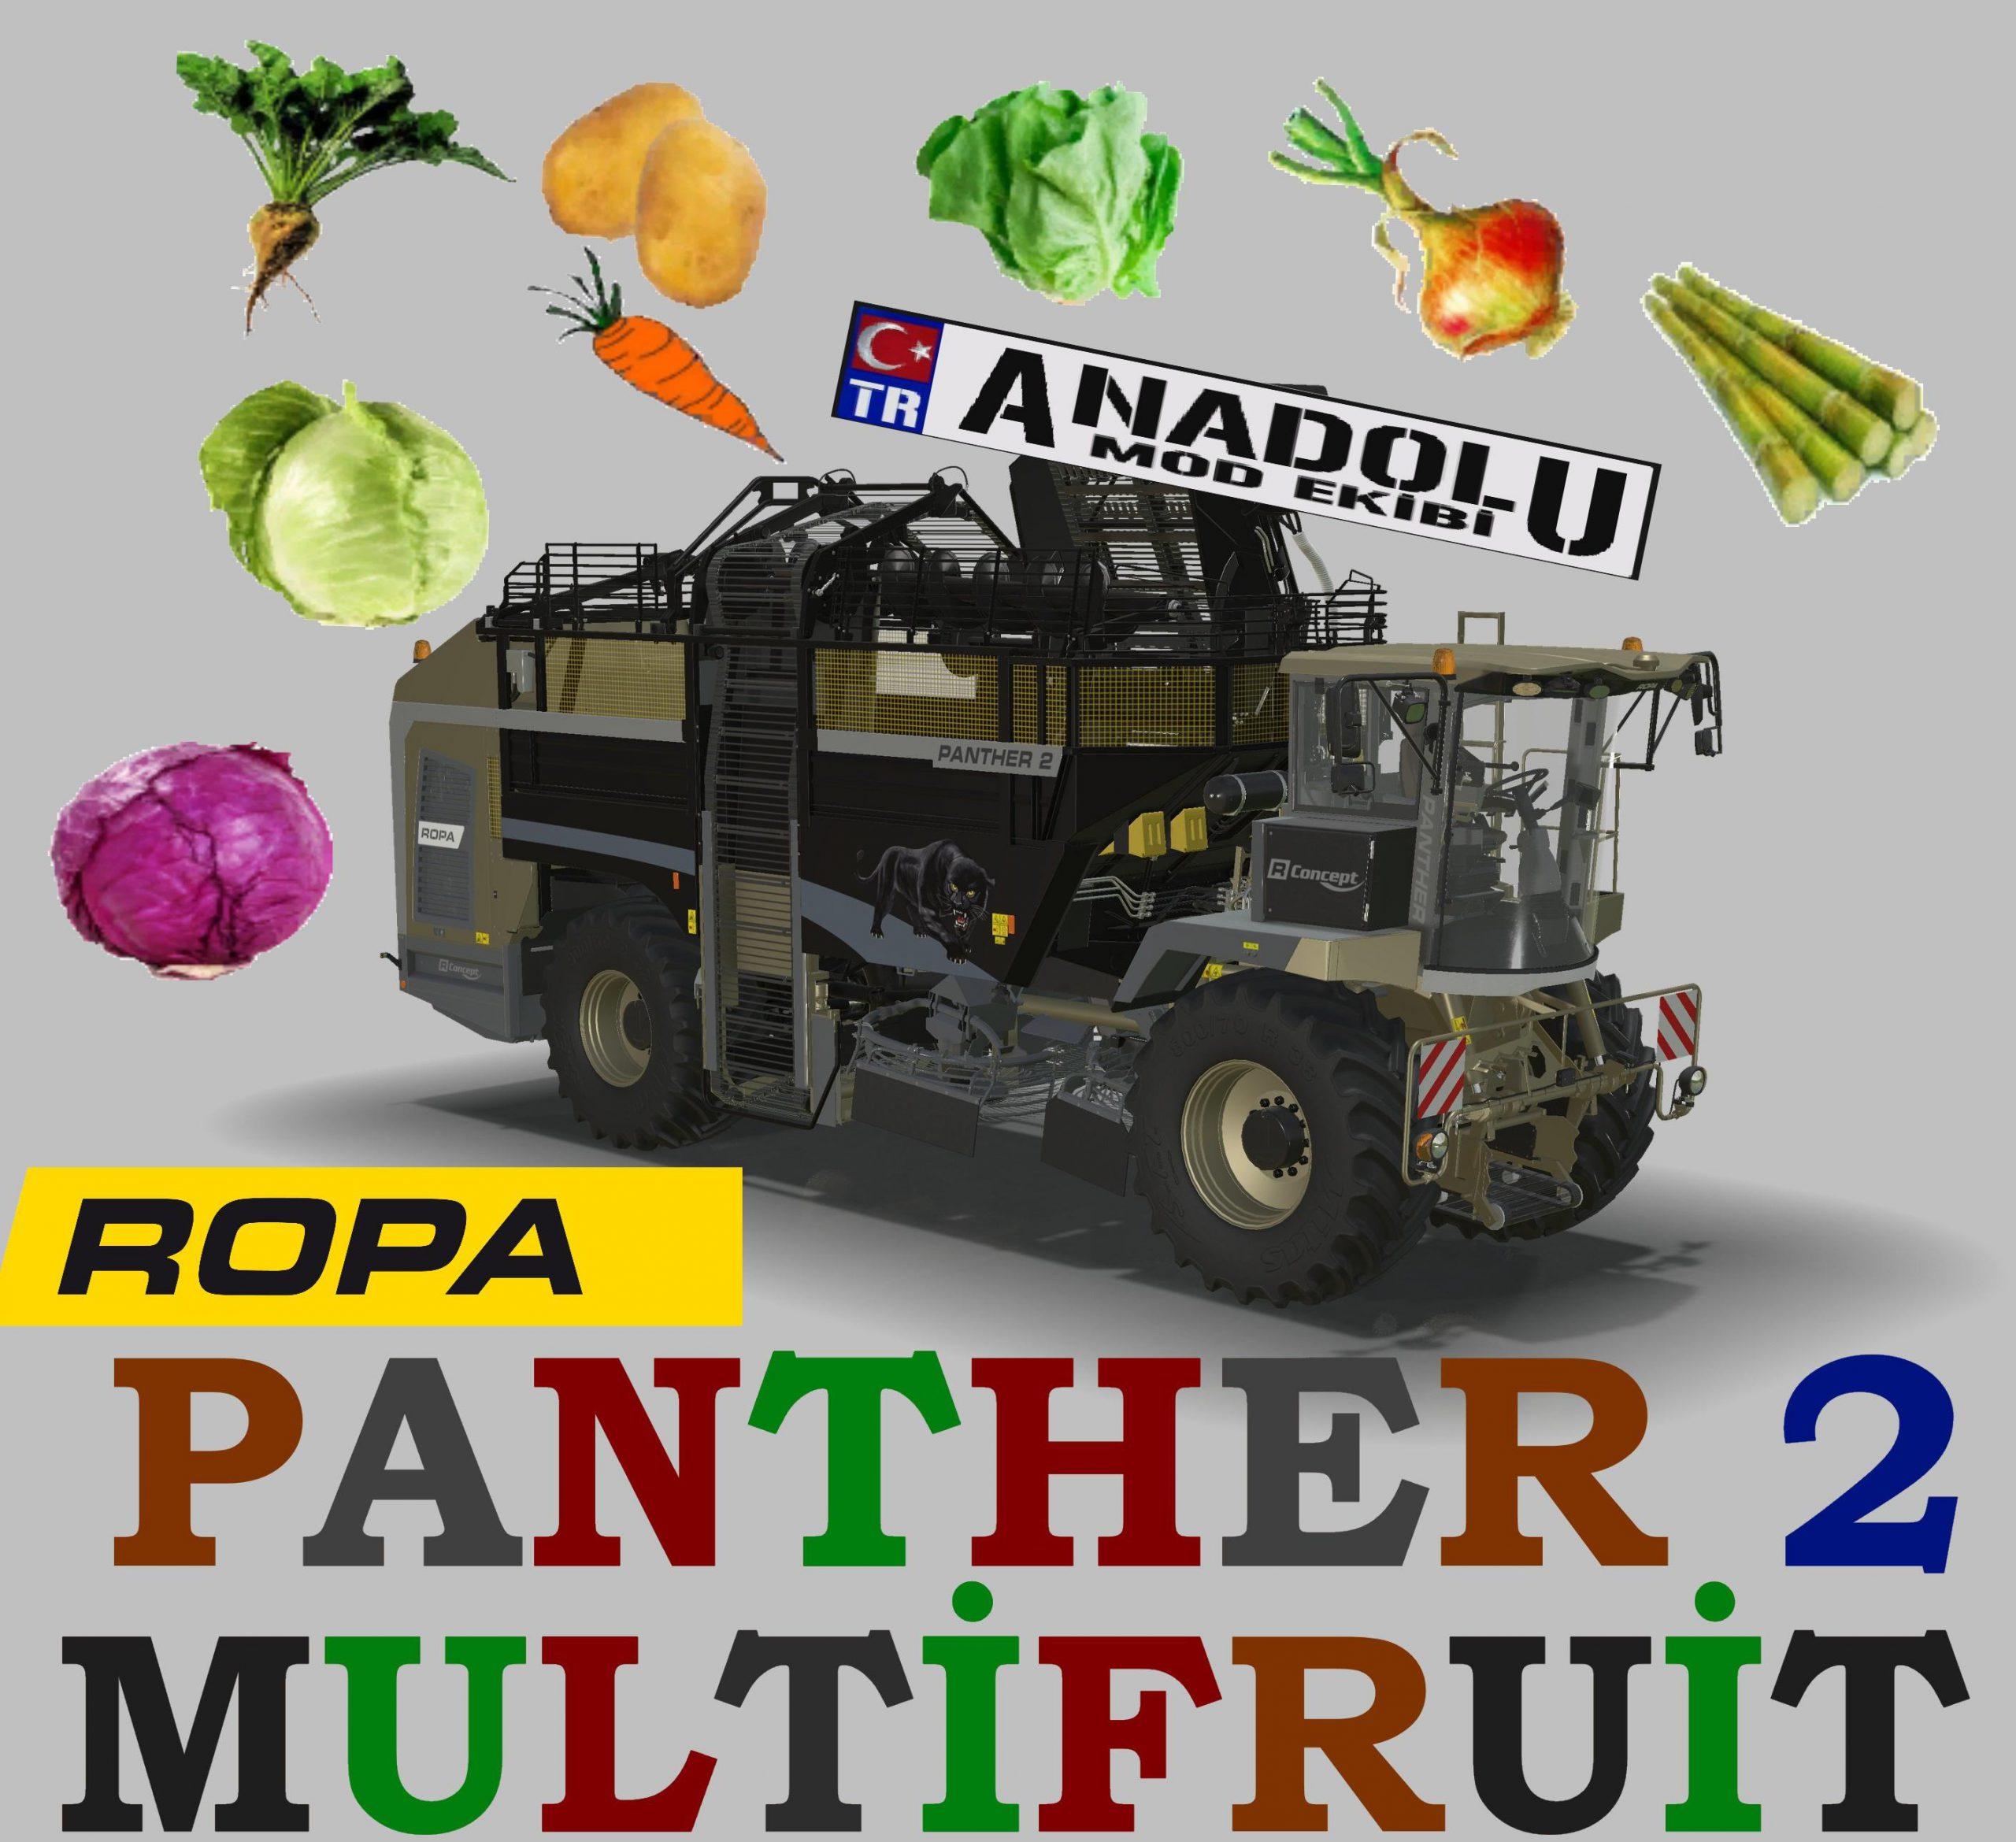 ROPA-PANTHER-2-MULTIFRUIT-V1.0-scaled.jp